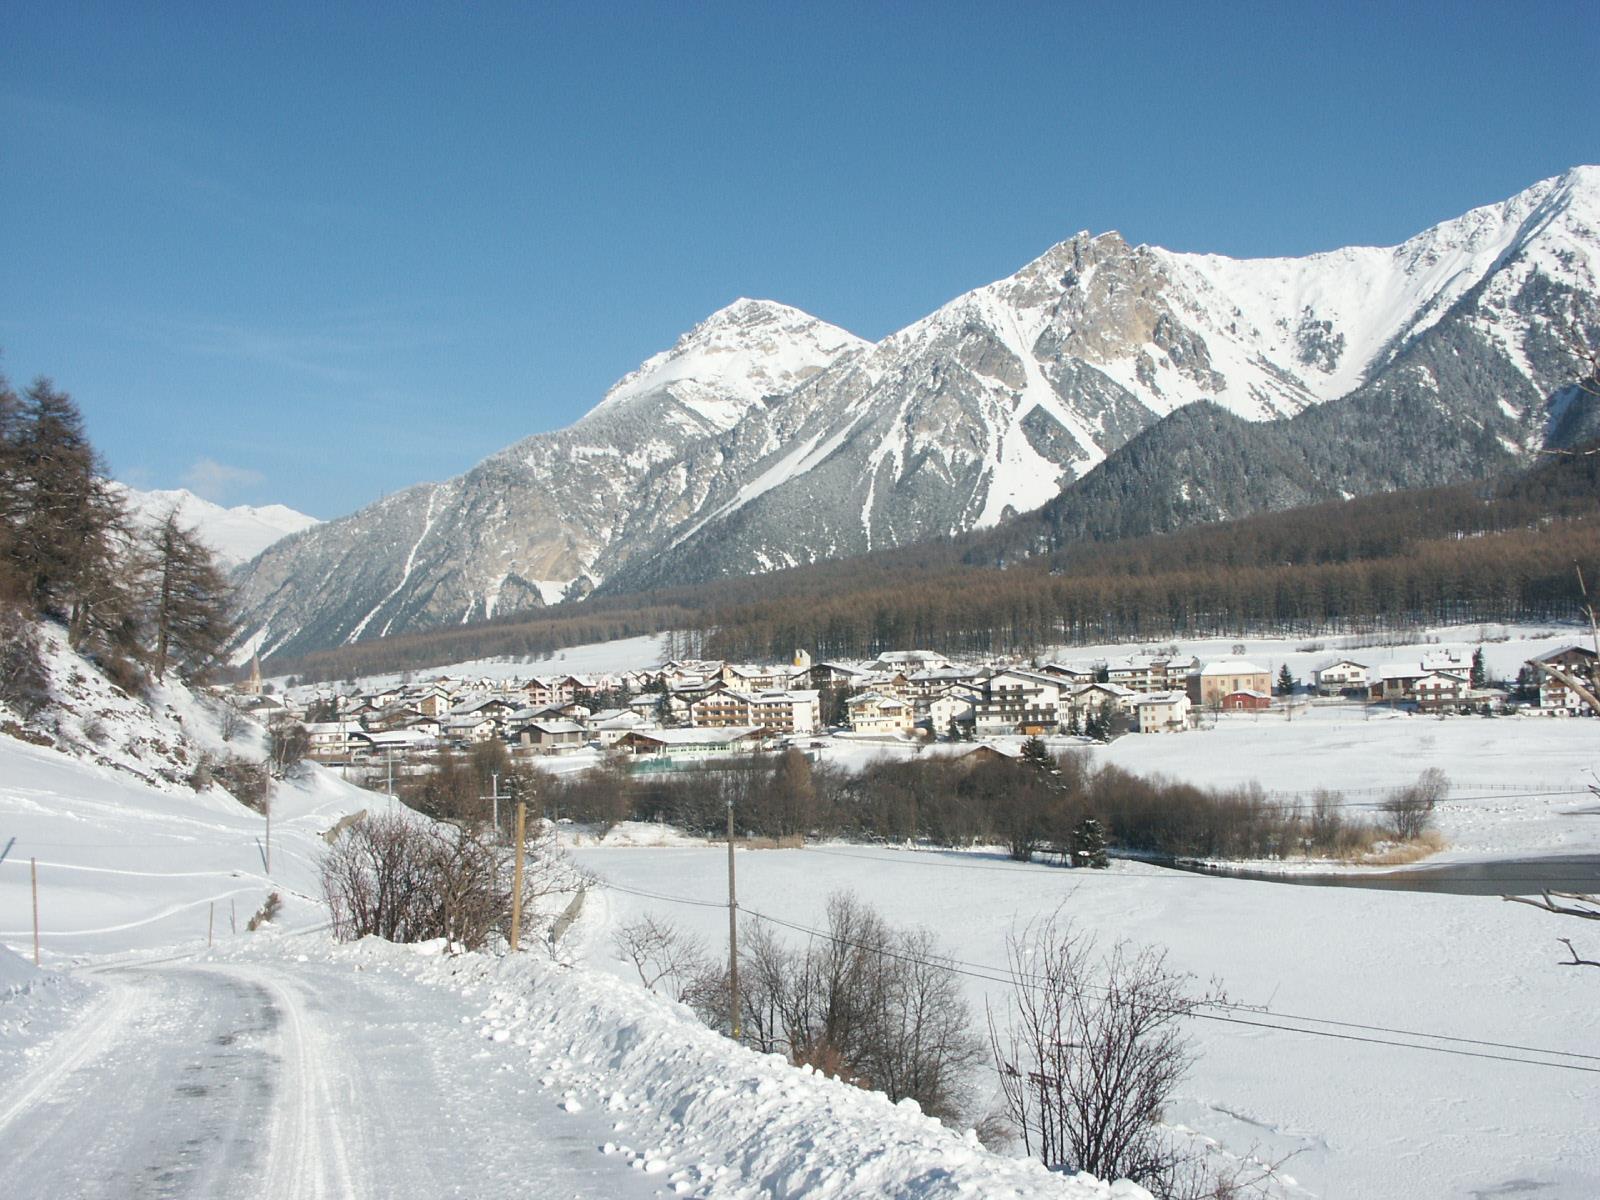 Schneeschuhwanderung zur Brugger Alm